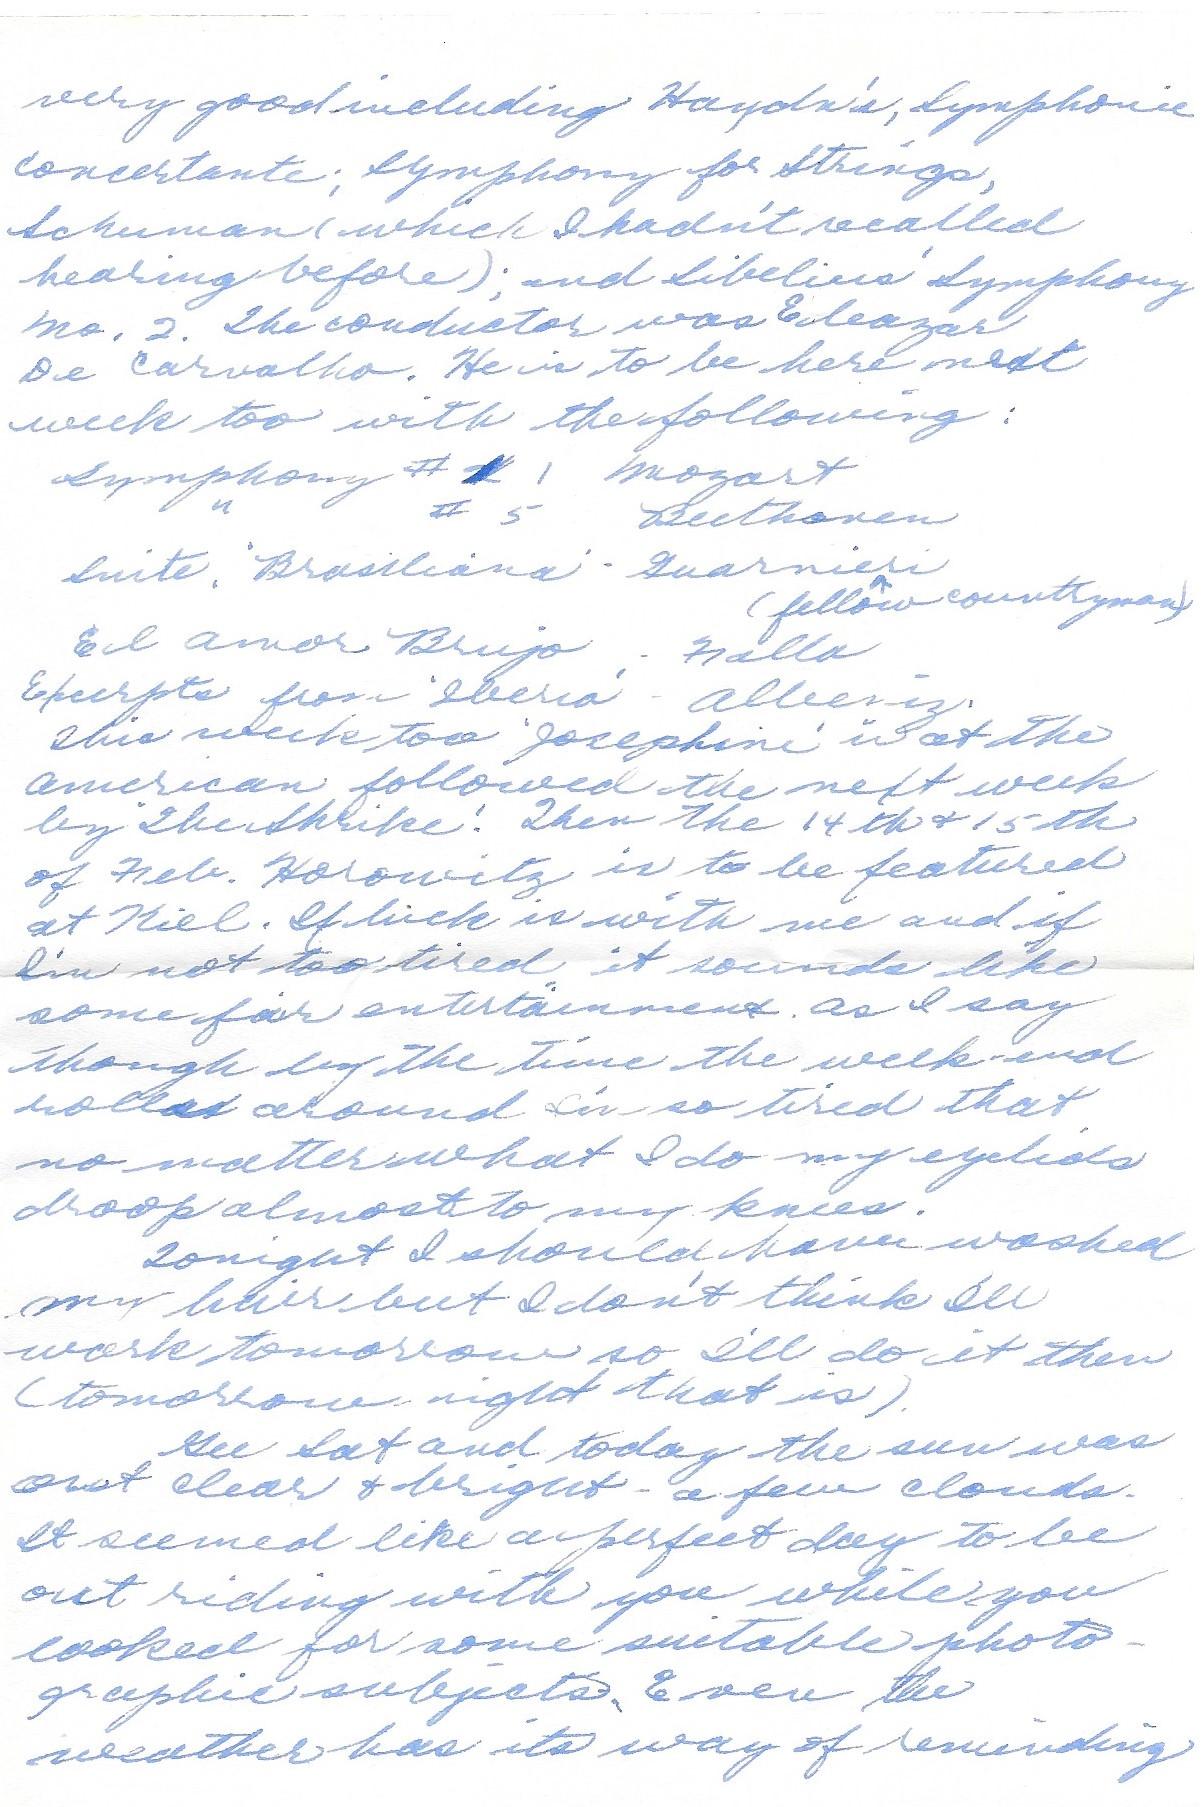 14. Jan. 25, 1953 (Oma)_Page_2 (Rescan).jpeg